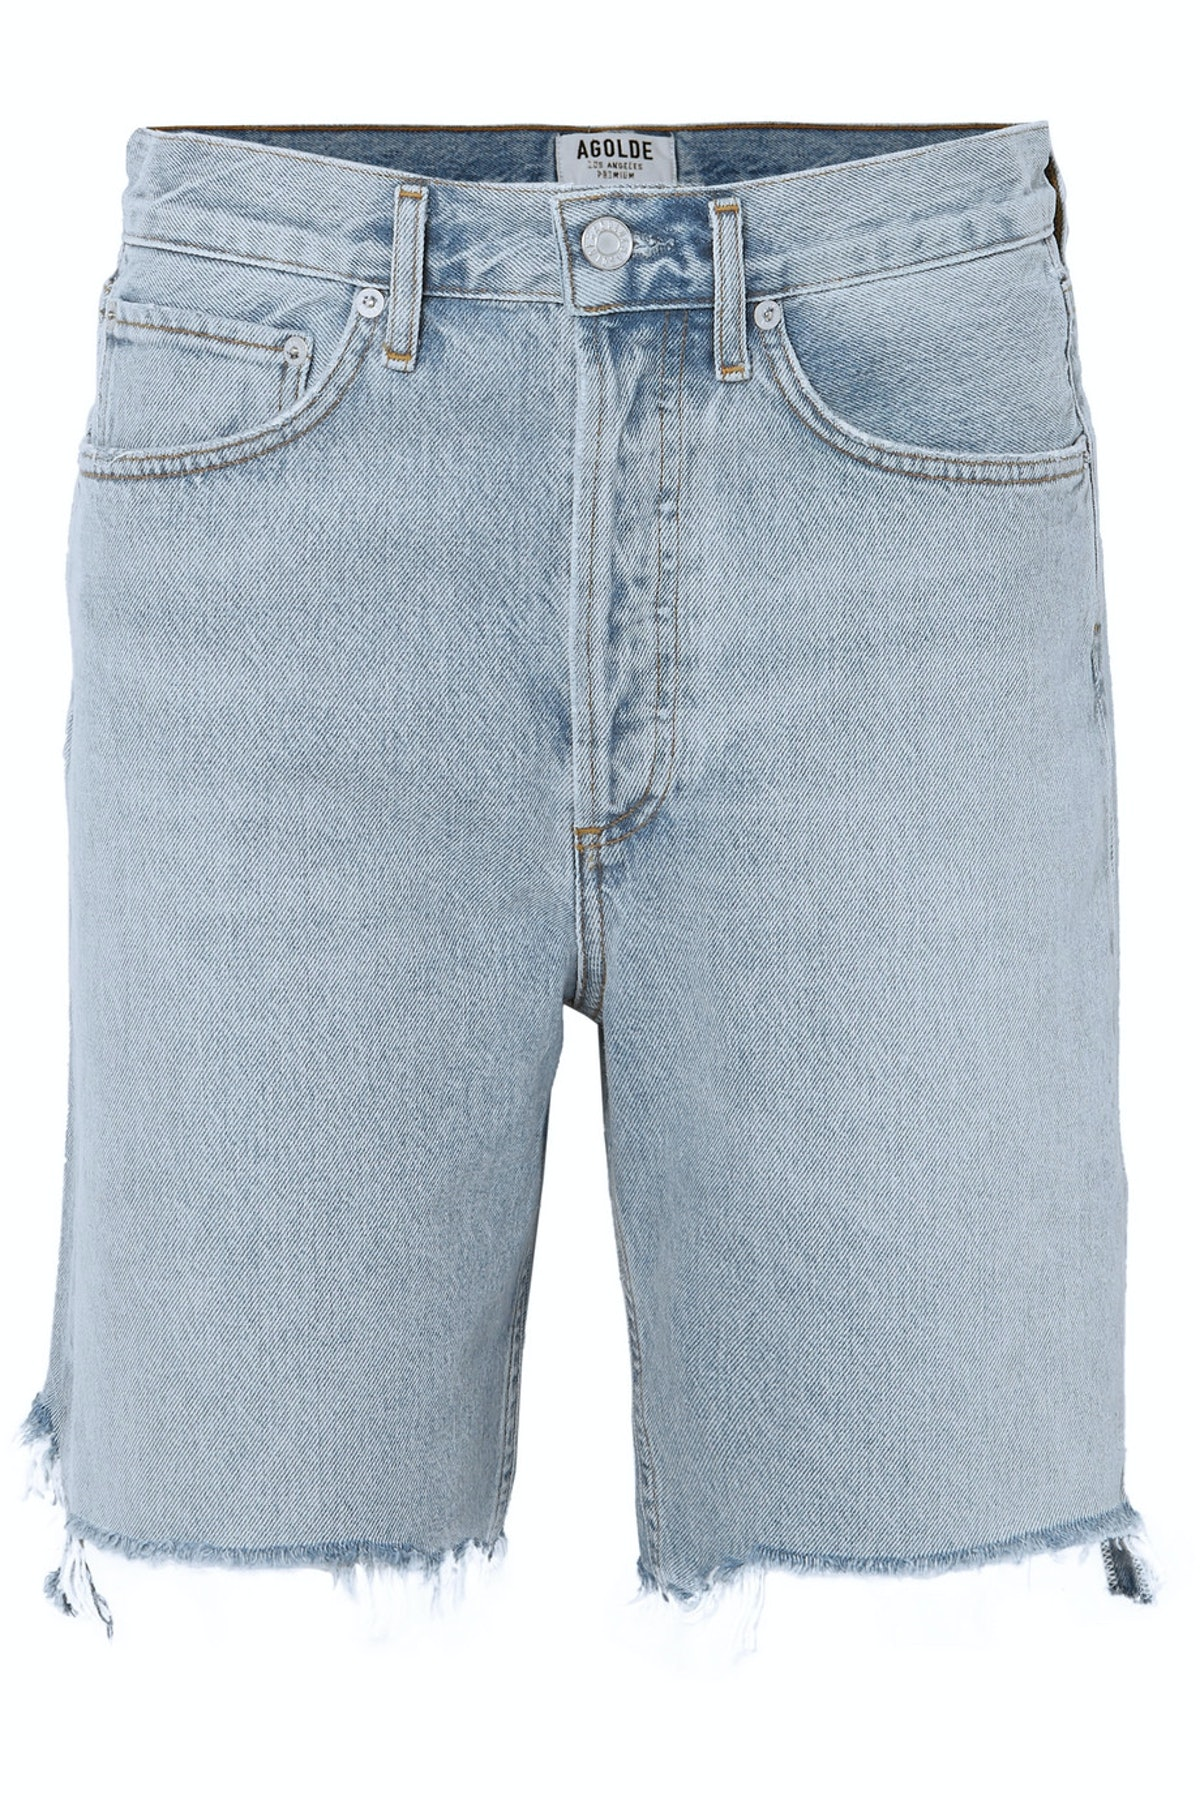 '90s Distressed Denim Shorts